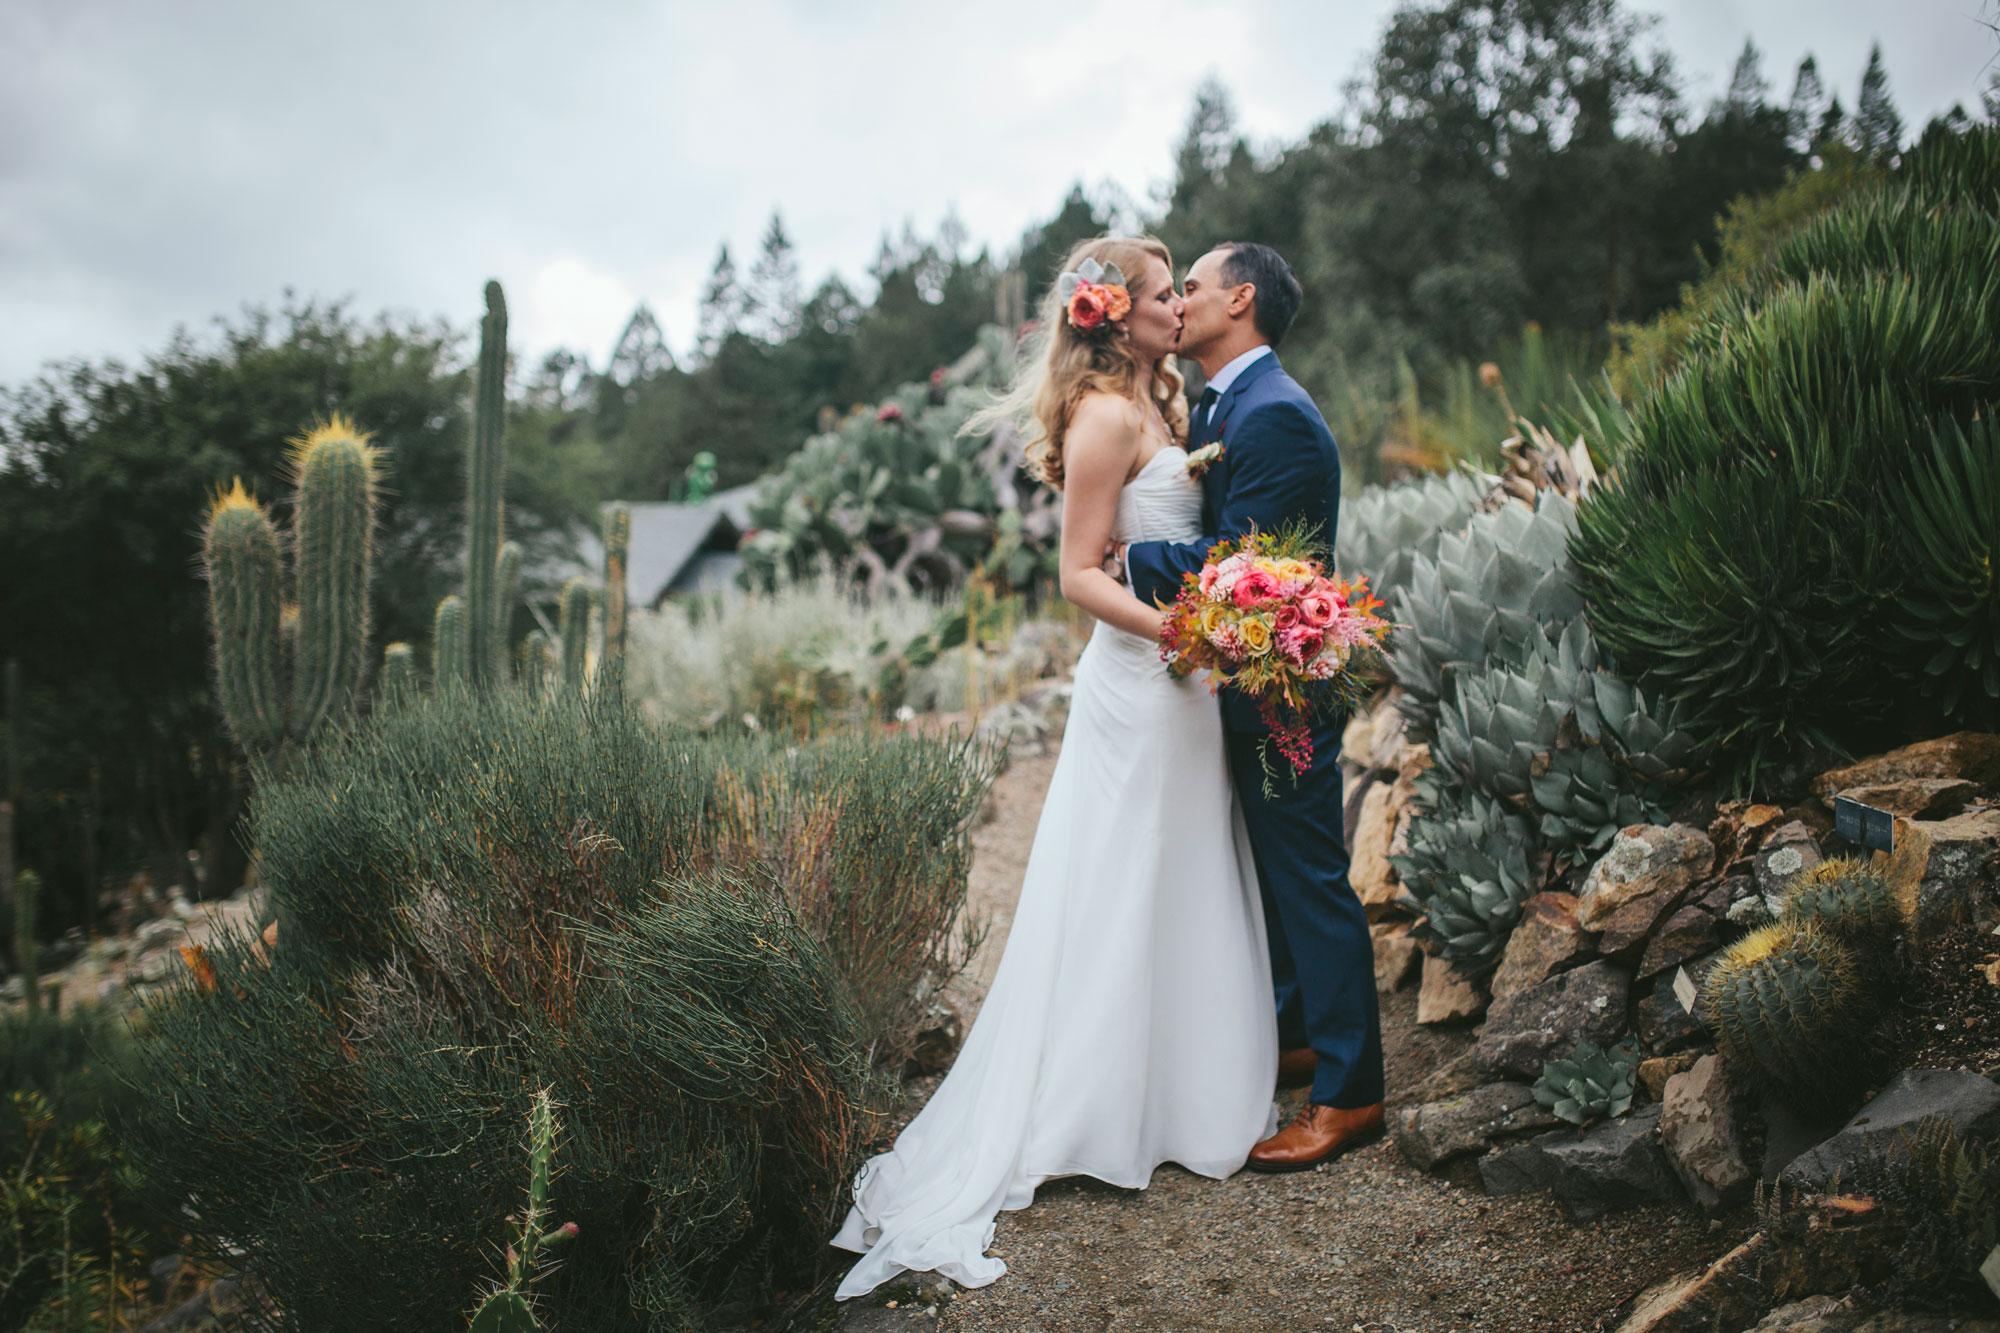 UC Berkeley Botanical Garden Wedding - by Becca Henry Photography